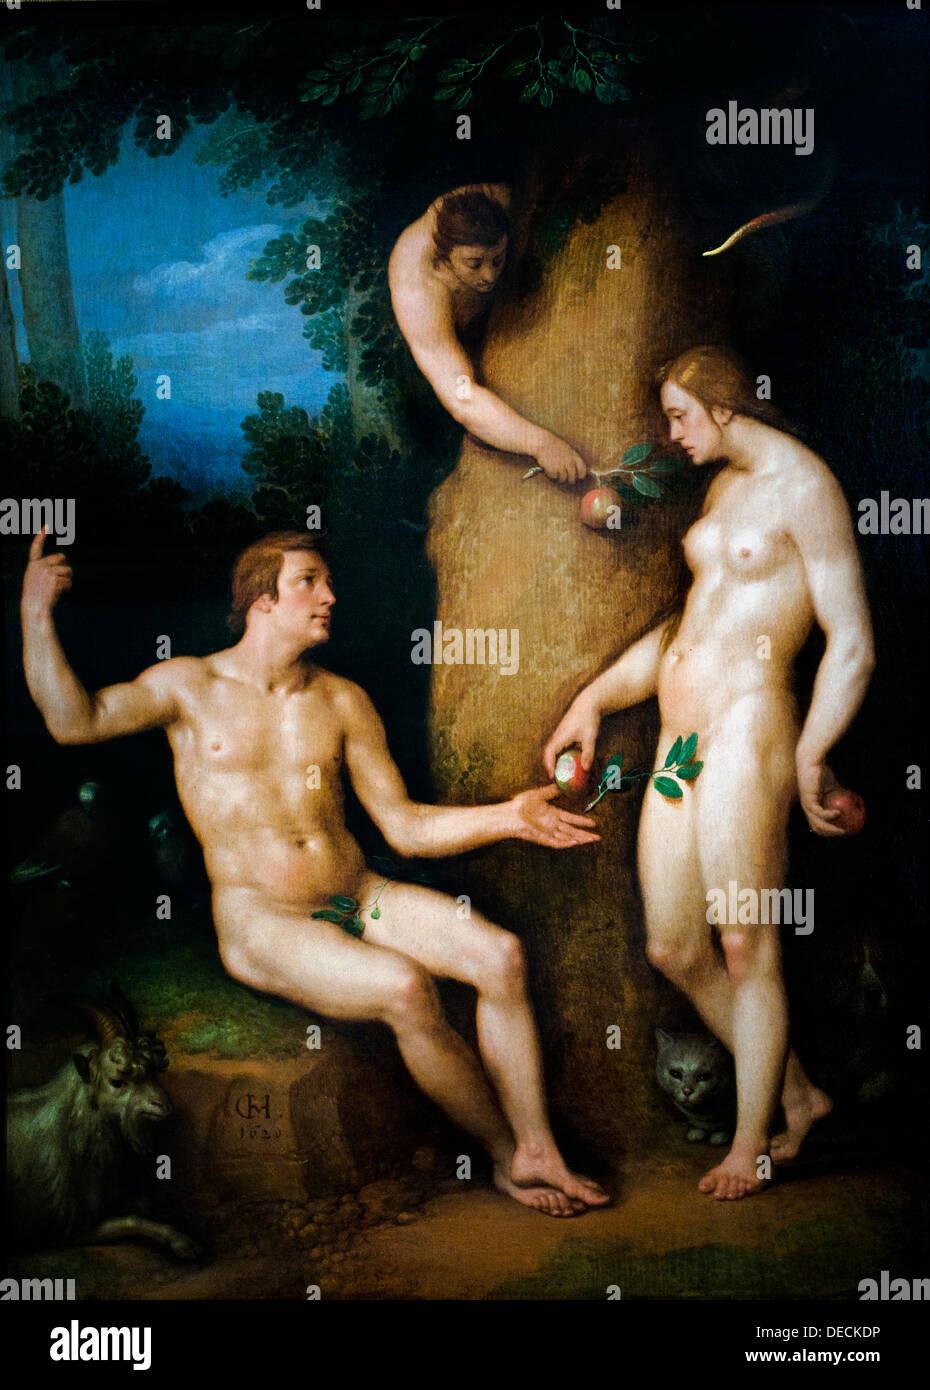 adam and eve 1621 cornelis cornelisz van haarlem 1562 1638 dutch